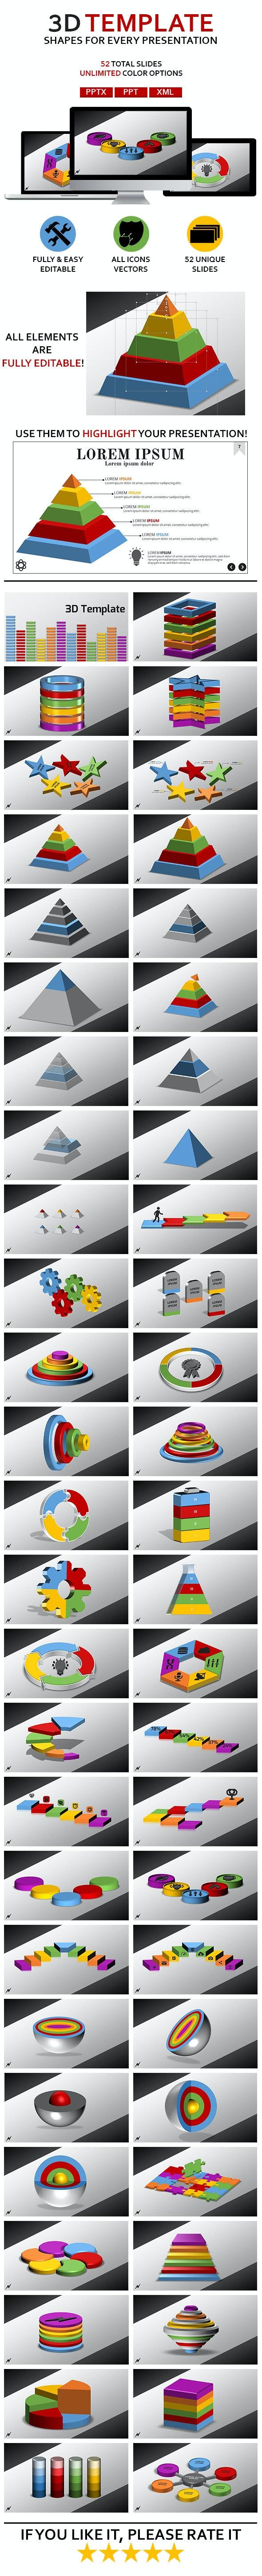 3D Shapes - Miscellaneous PowerPoint Templates